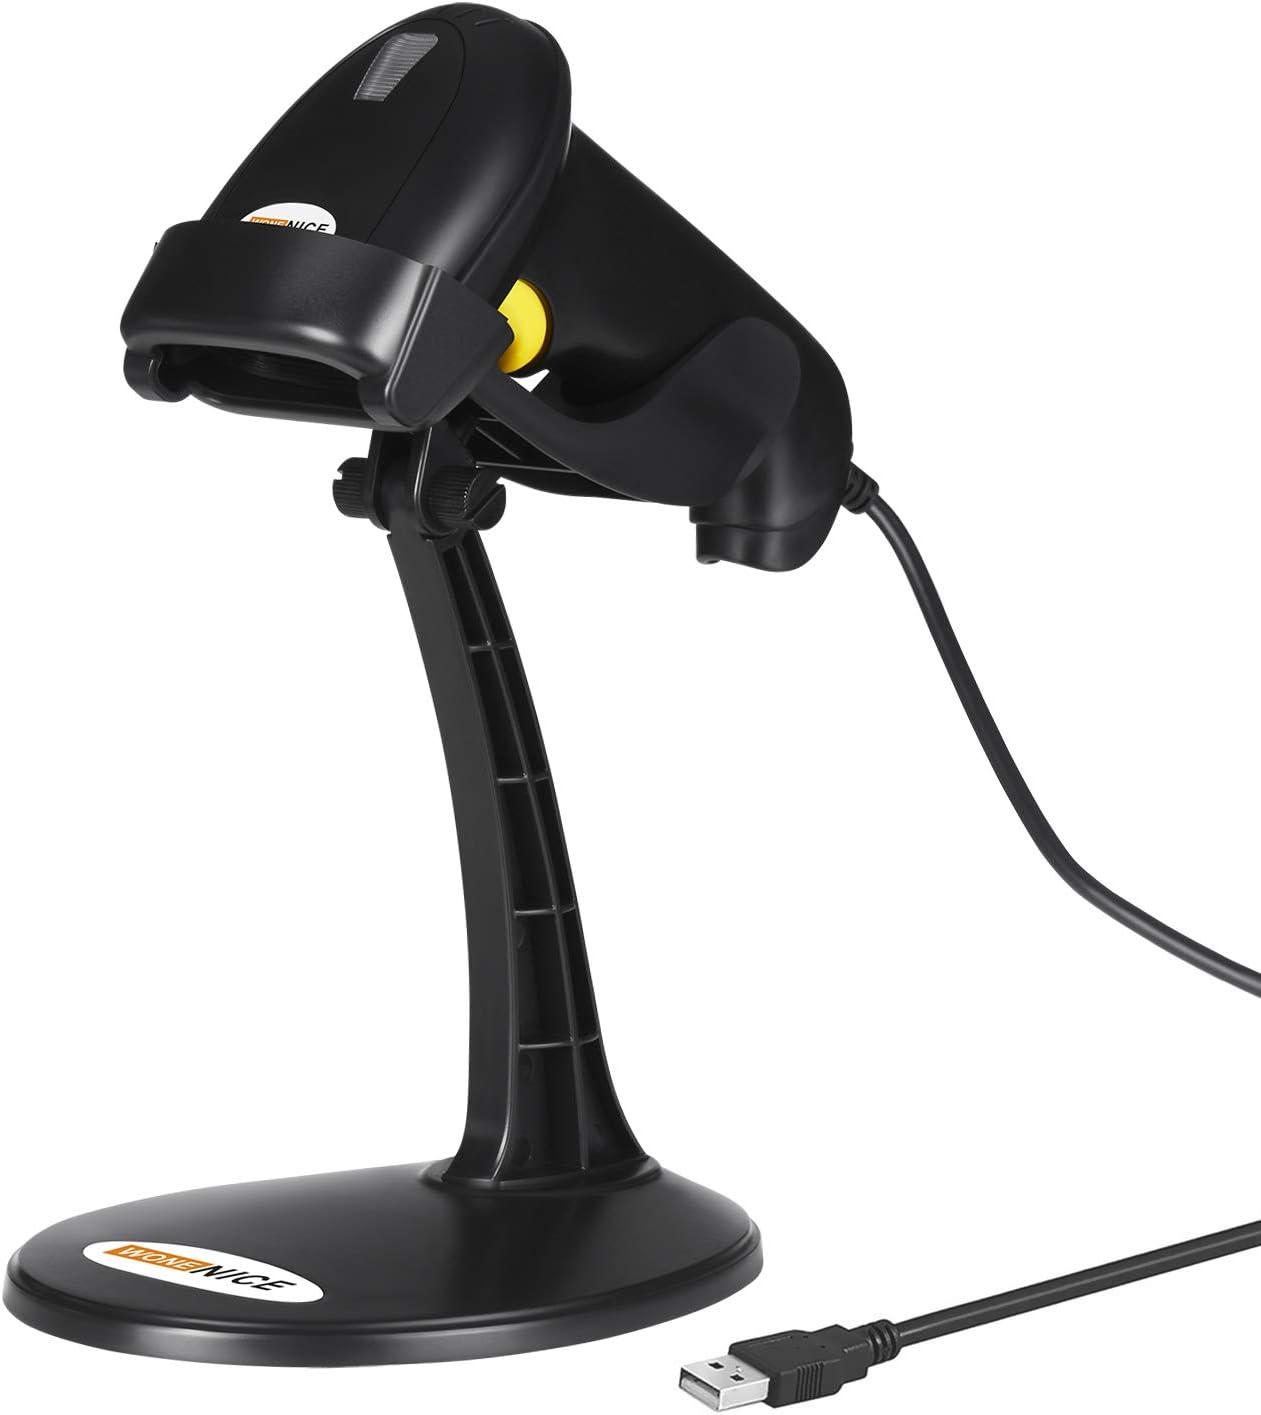 WoneNice Barcode Scanner with Stand, Handheld Automatic Laser USB Barcode Scanner Bar-Code Reader, Black